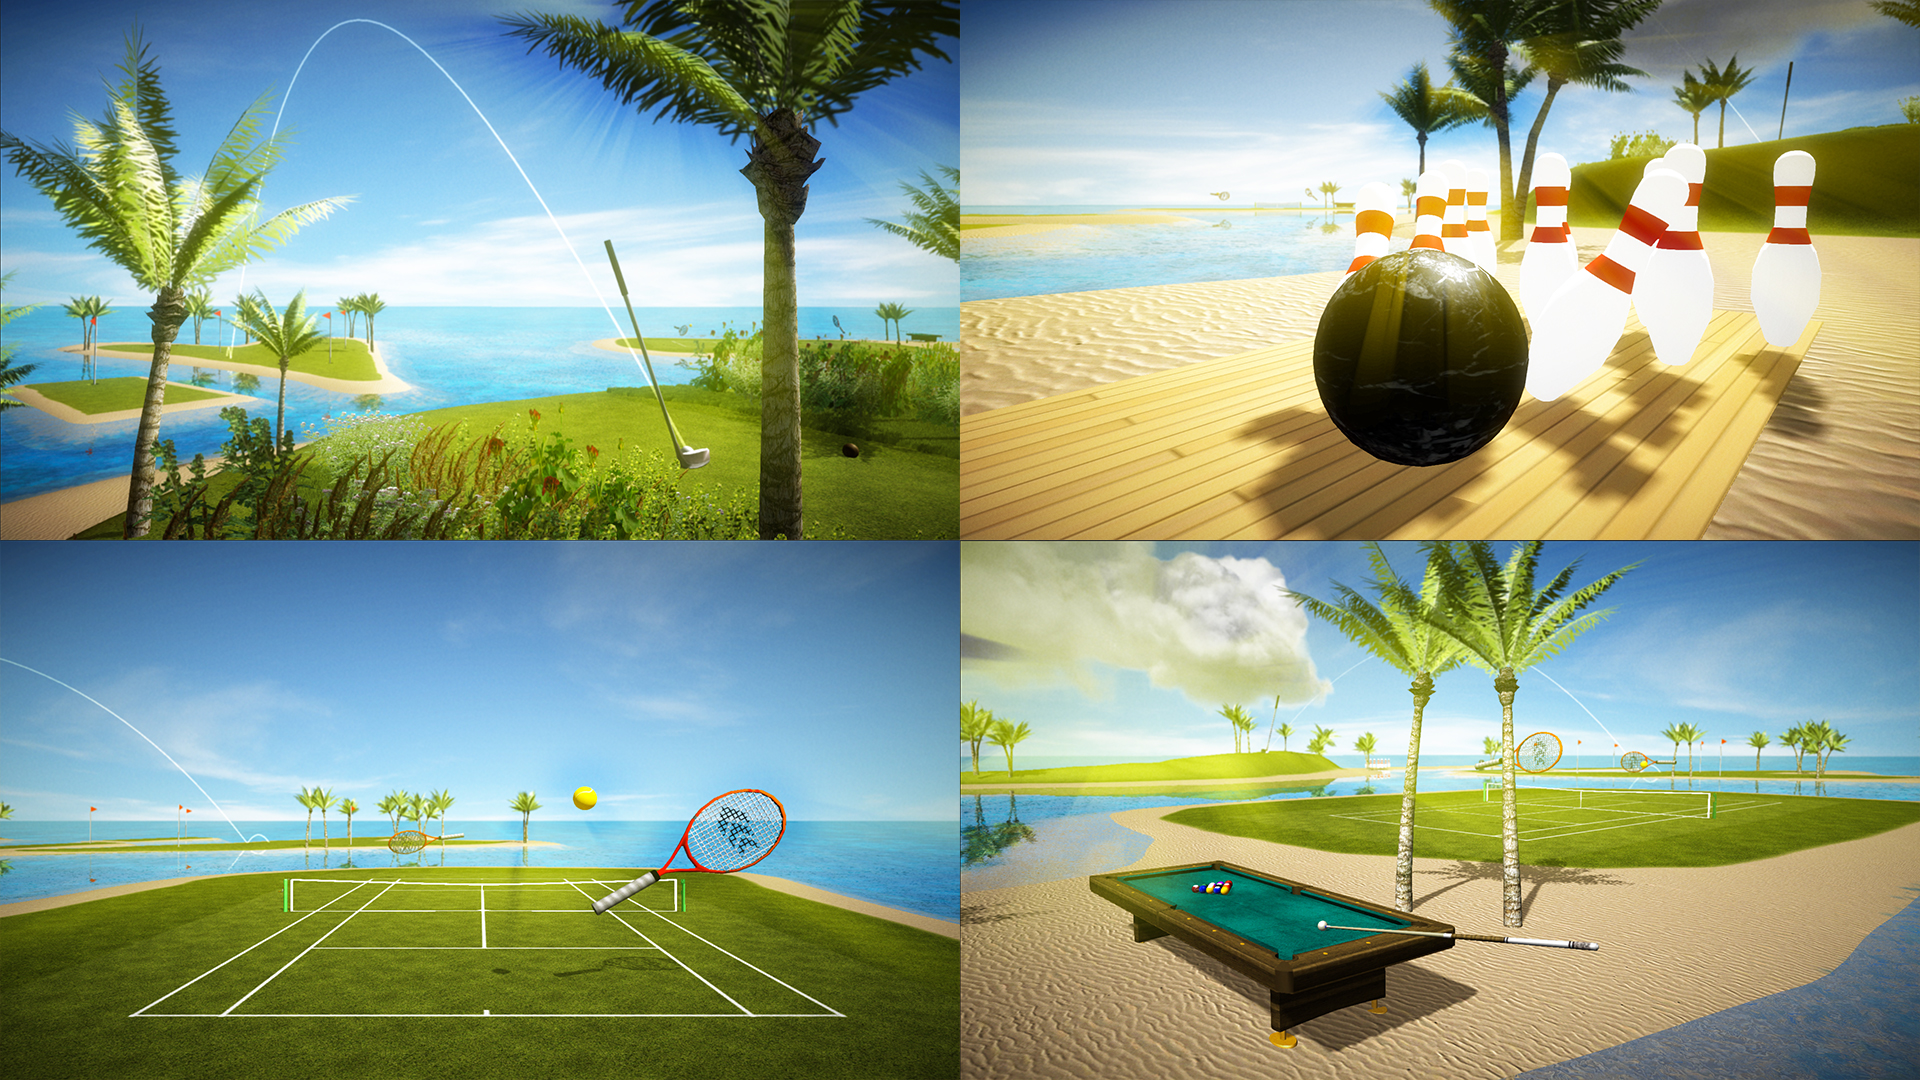 Sports Pro - Golf Tennis Bowling Pool screenshot 2